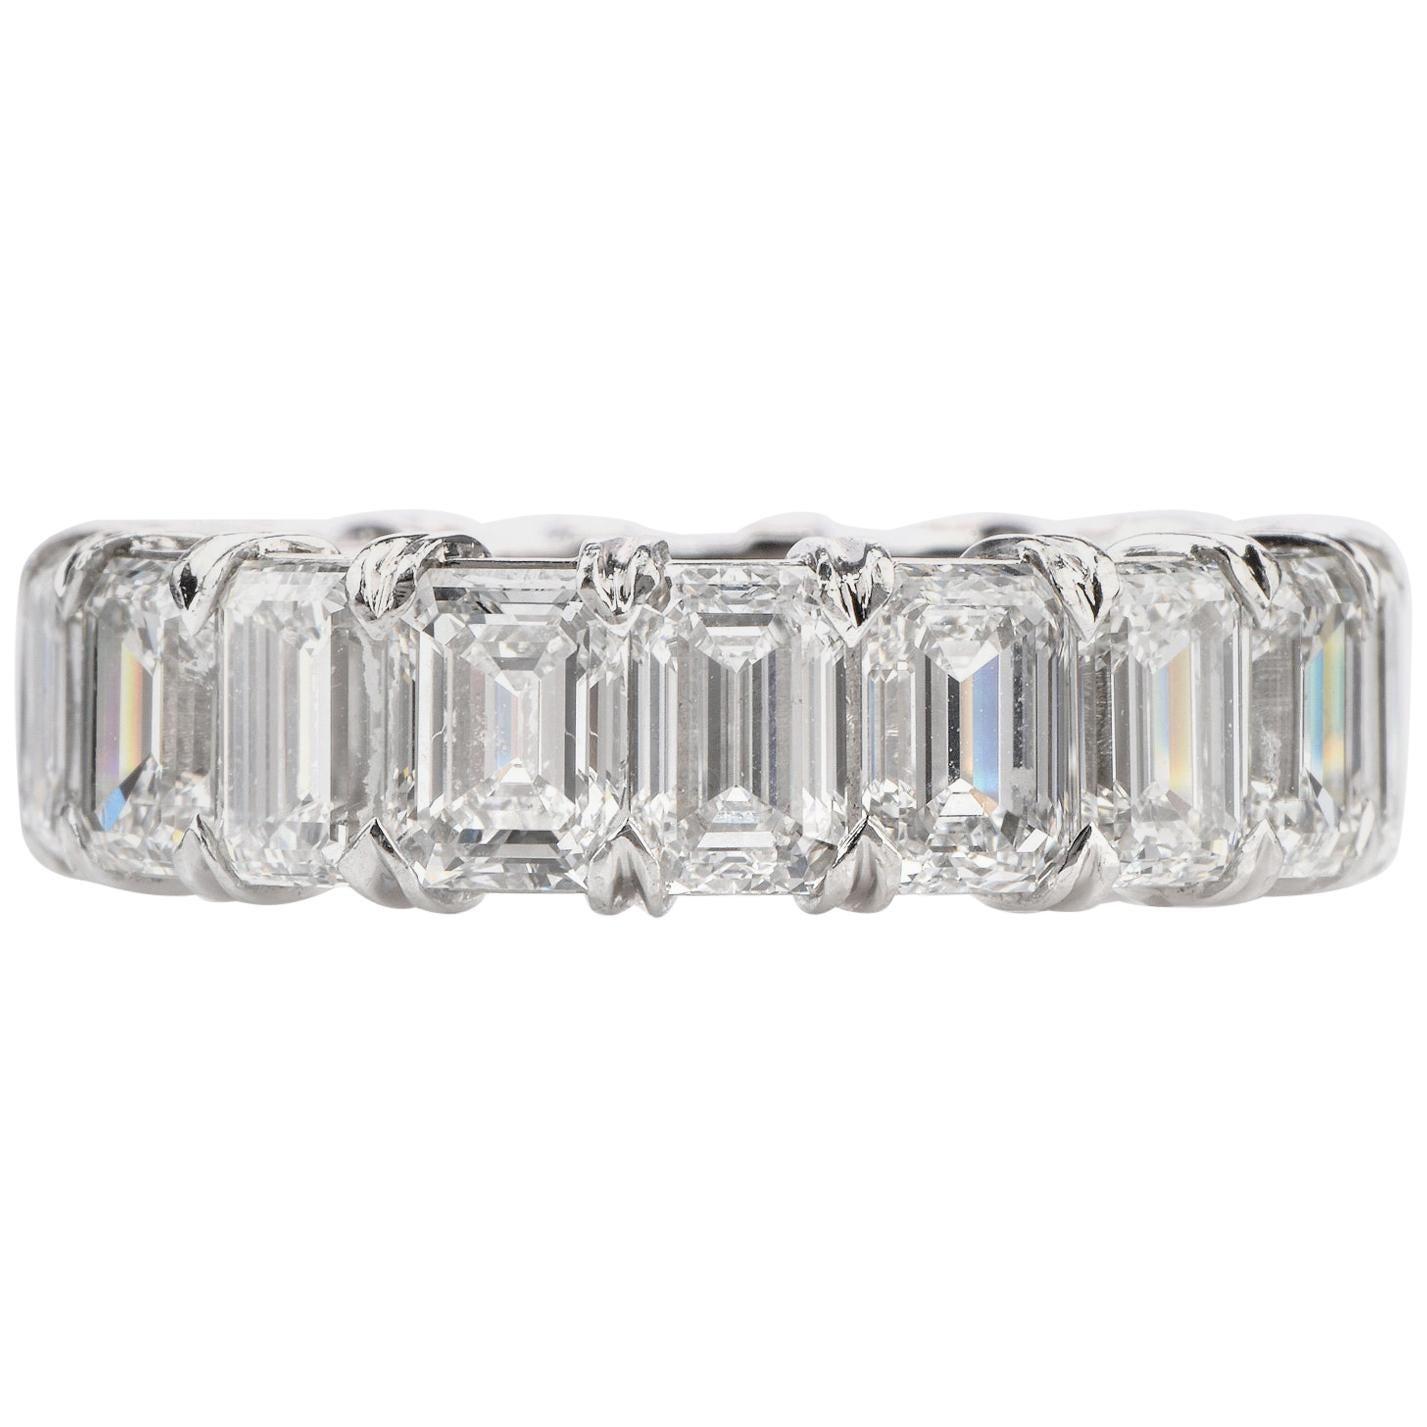 Certified 8.02 Carat Emerald Cut Diamond Platinum Eternity Band Ring